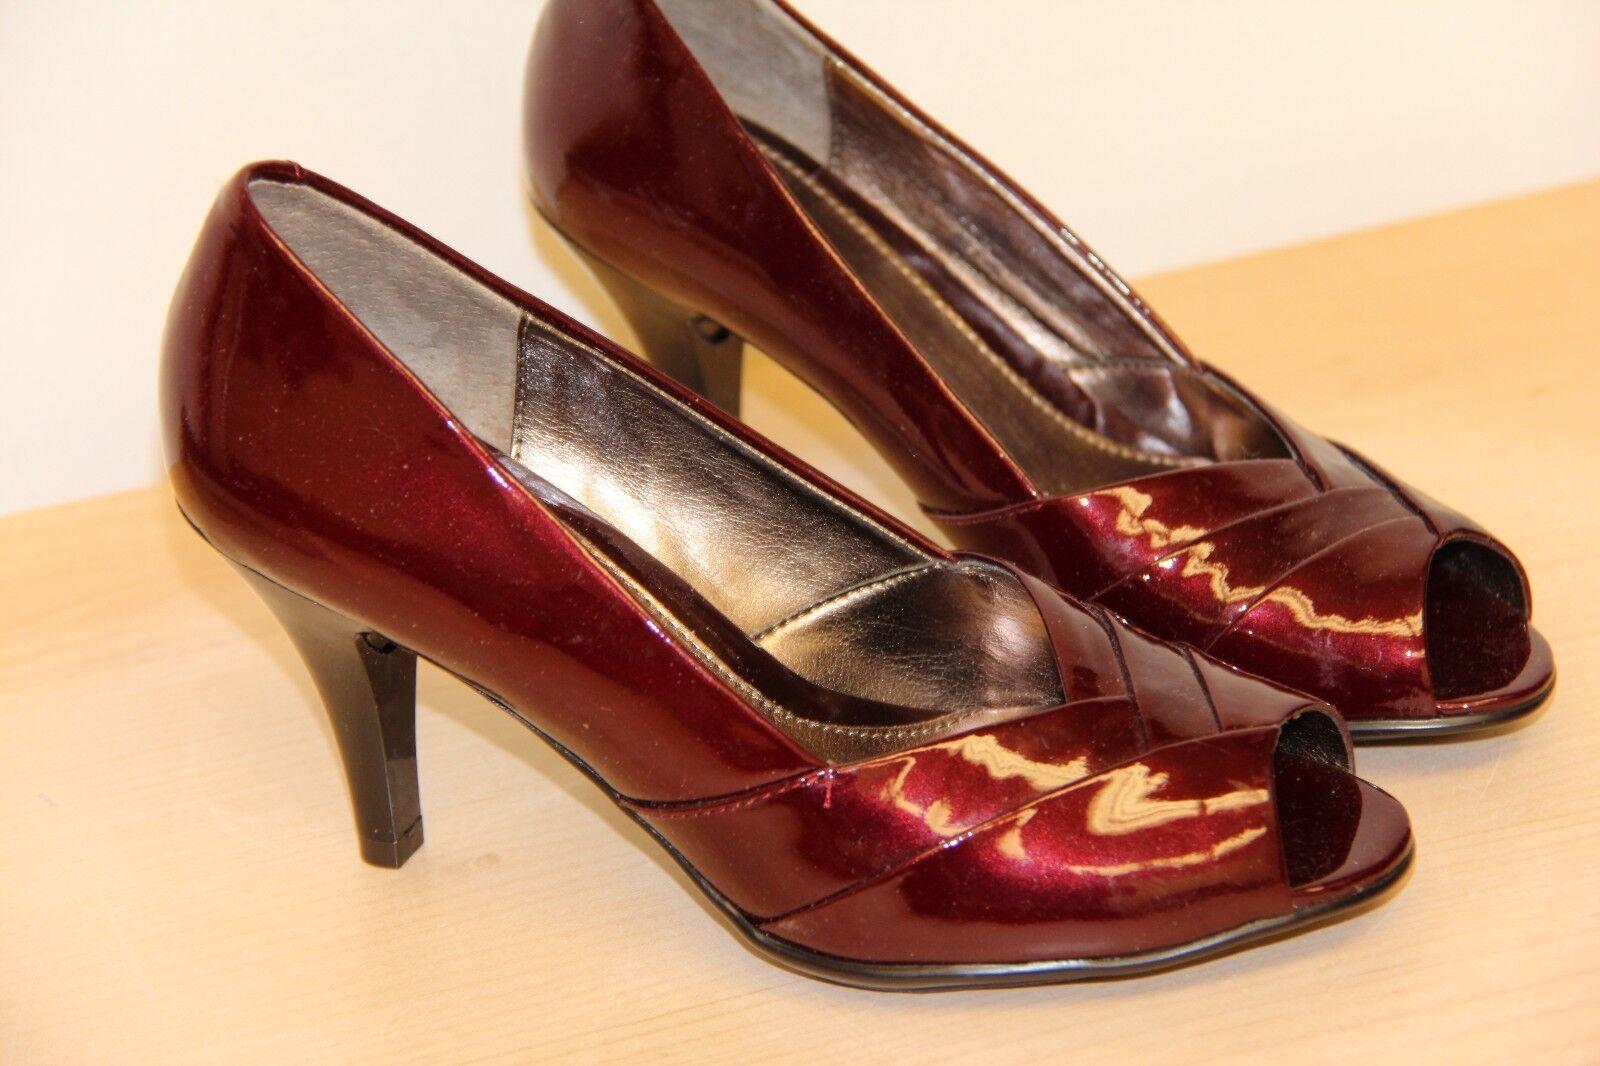 NIB Sofft Galilee Peep Toe Pumps Heels Sz 6.5 M  Bordeaux Pearl Patent